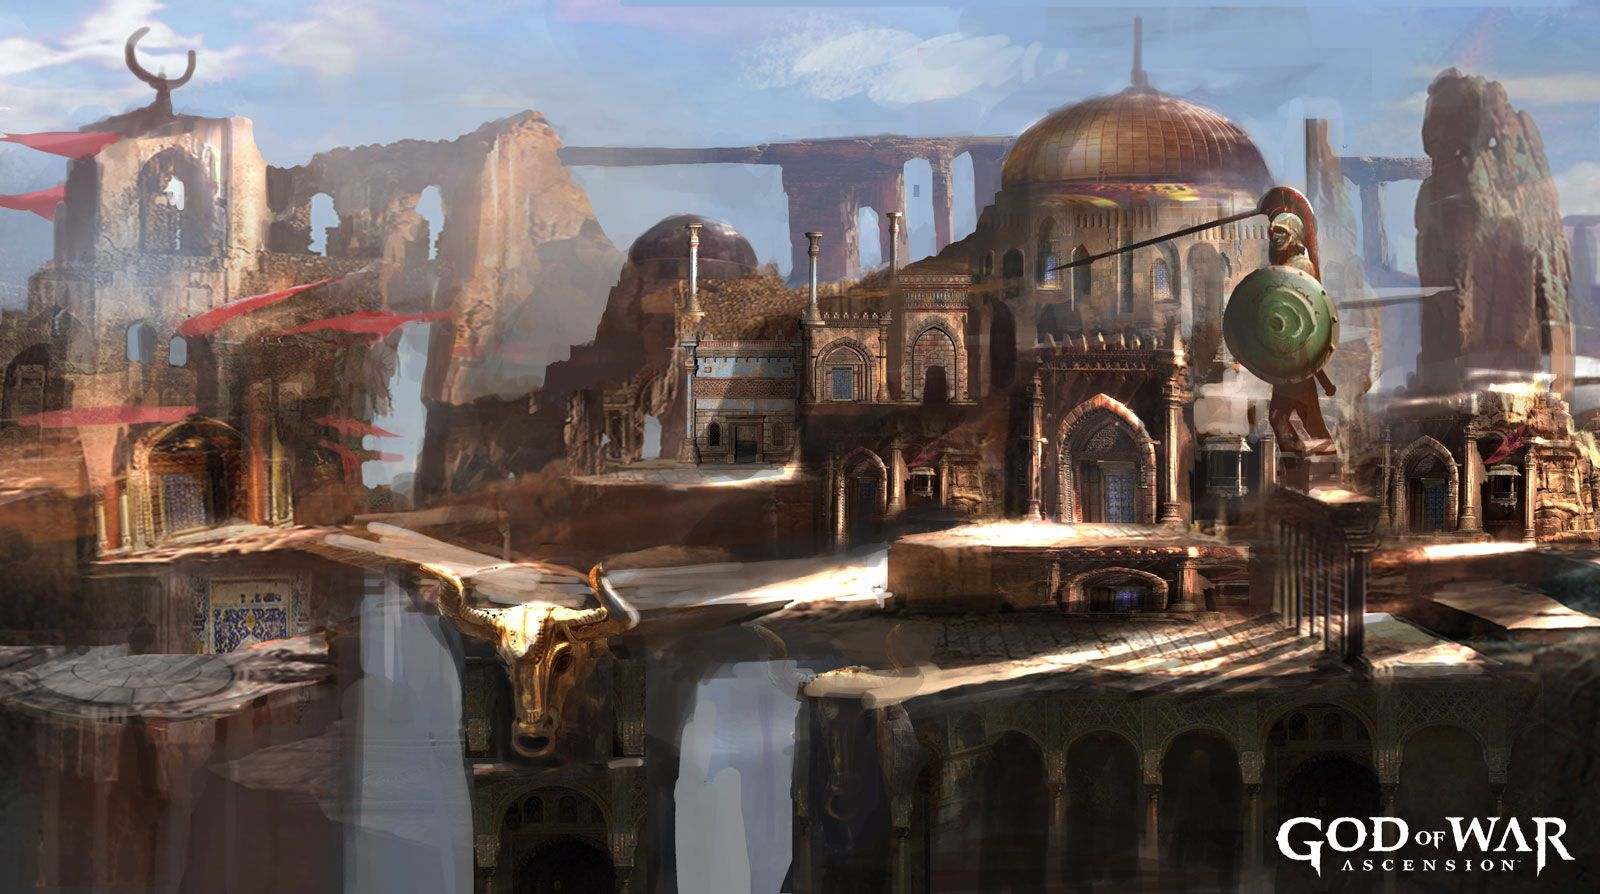 God-of-War-Ascension-Concept-Art-12-Canyons-Arena.jpg (1600×894)